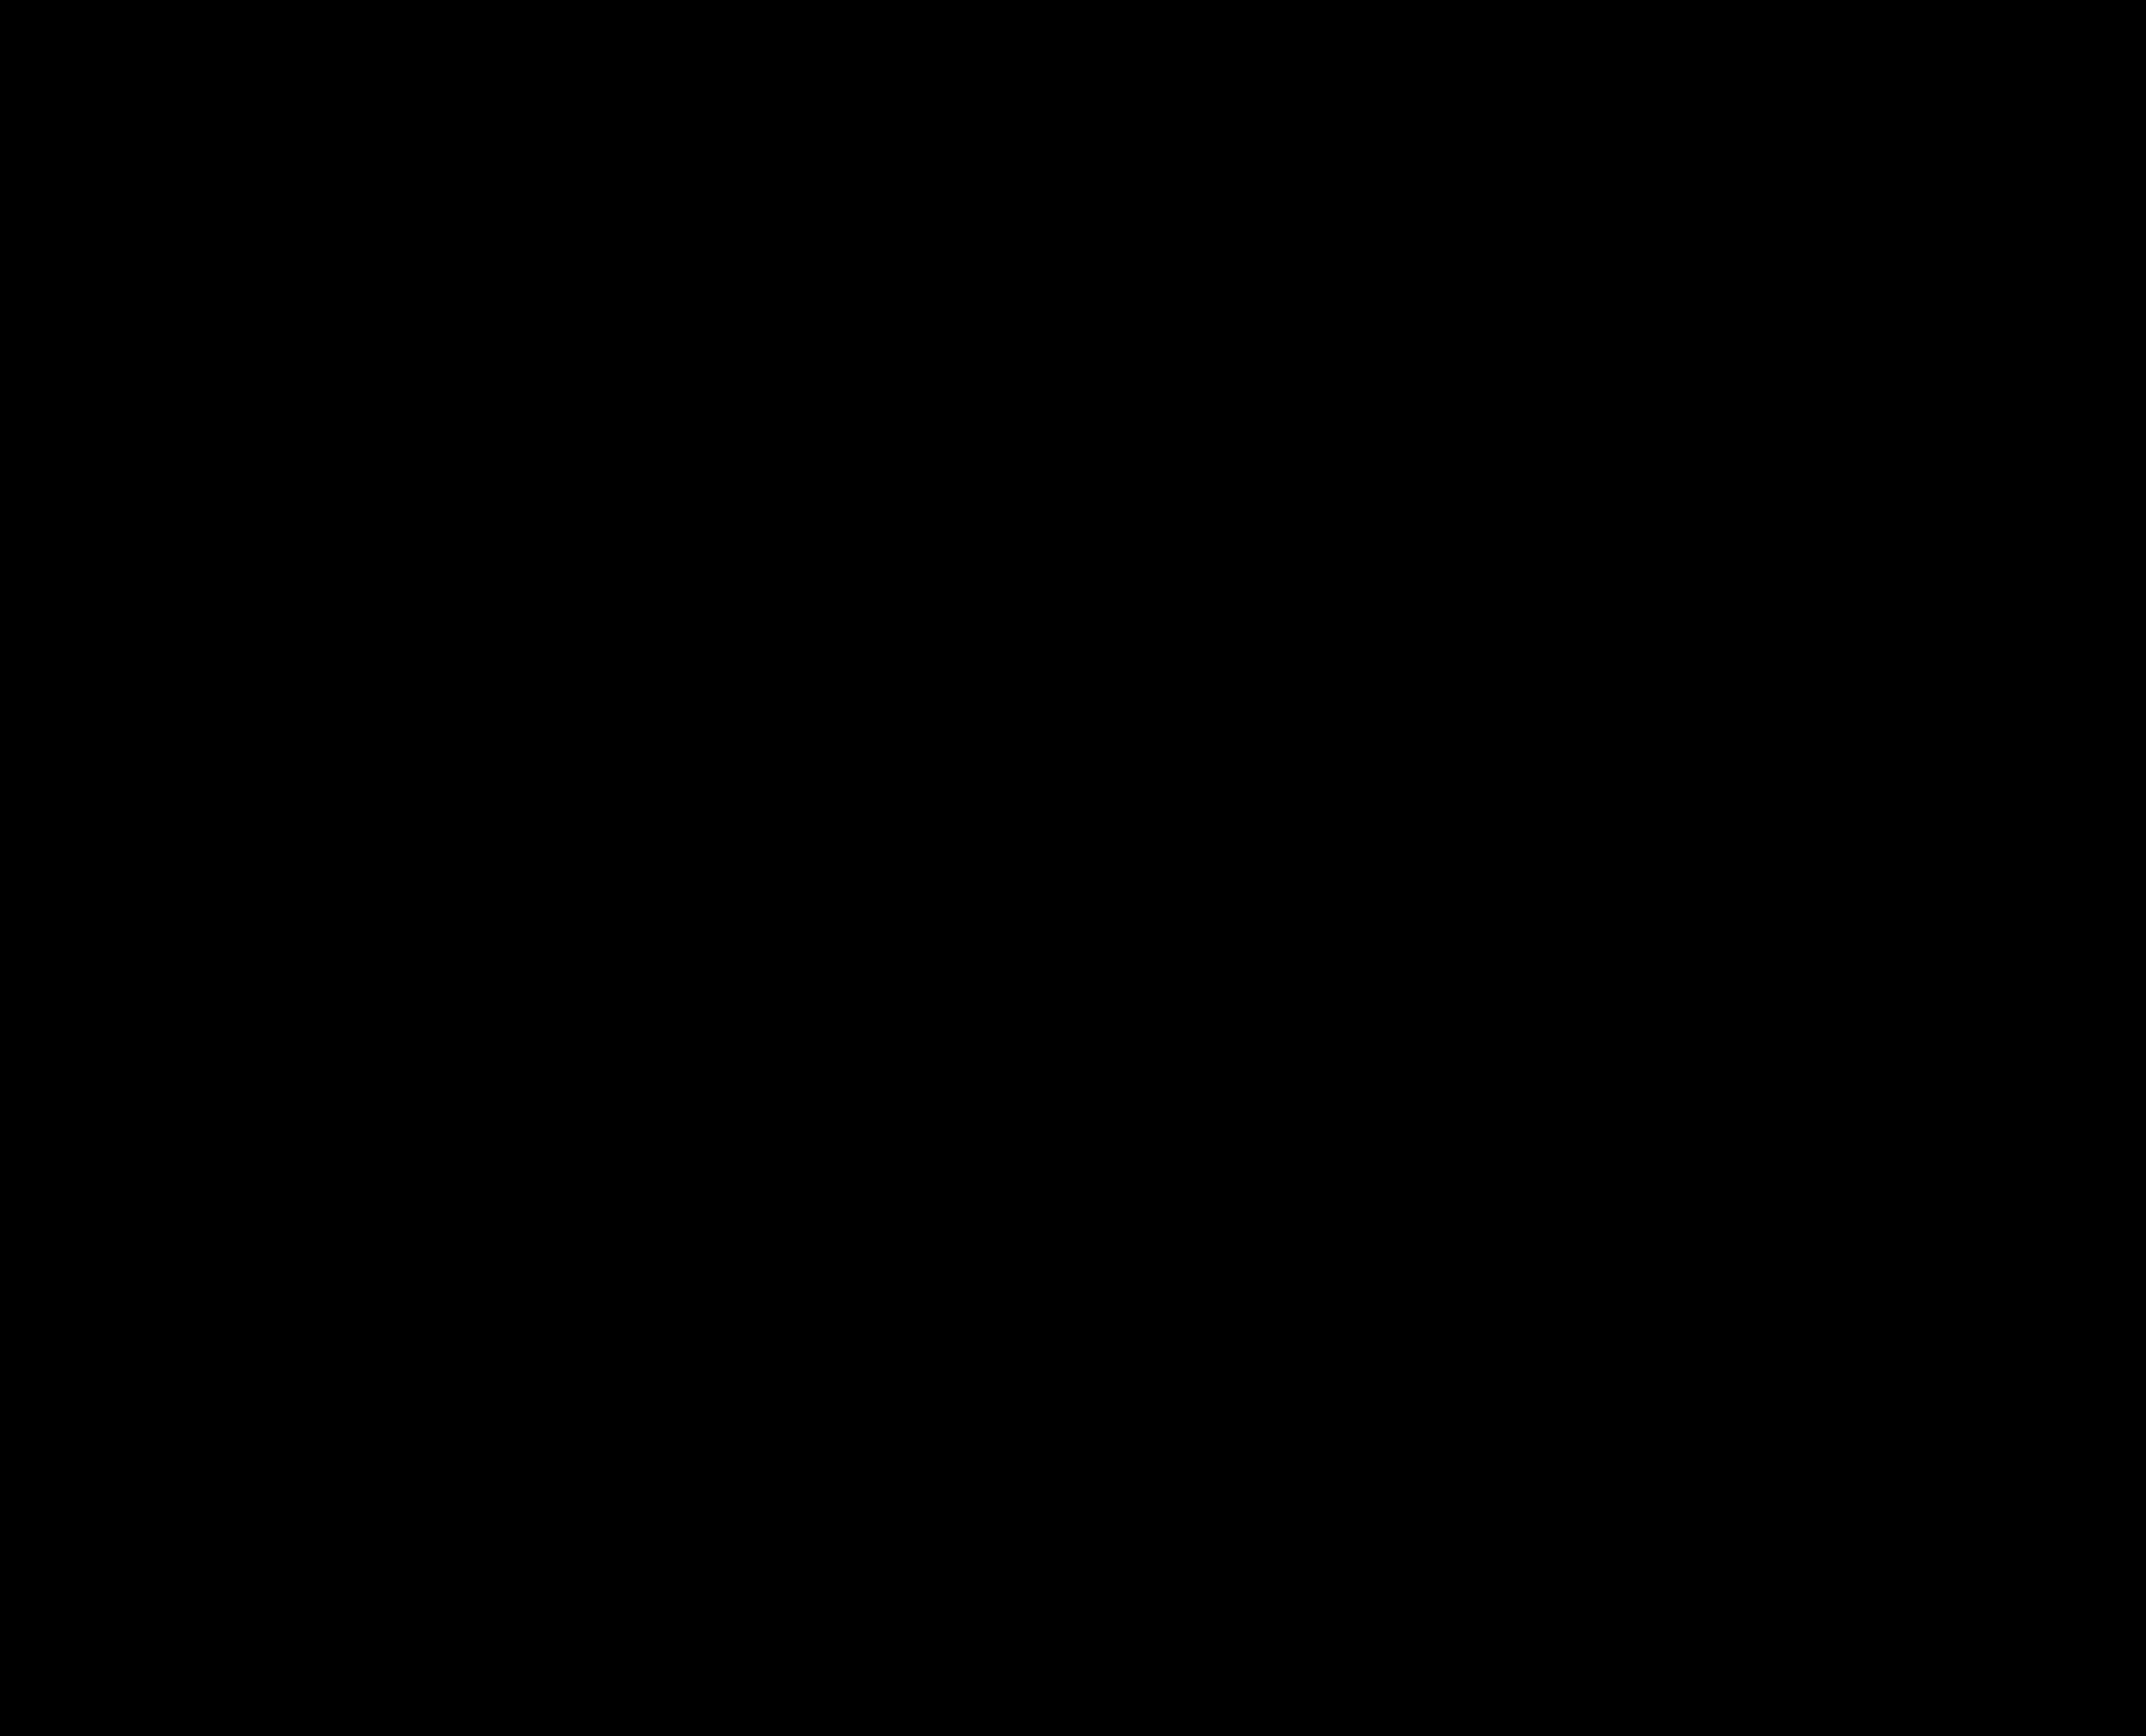 3425x2771 Legal Scales Black Silhouette